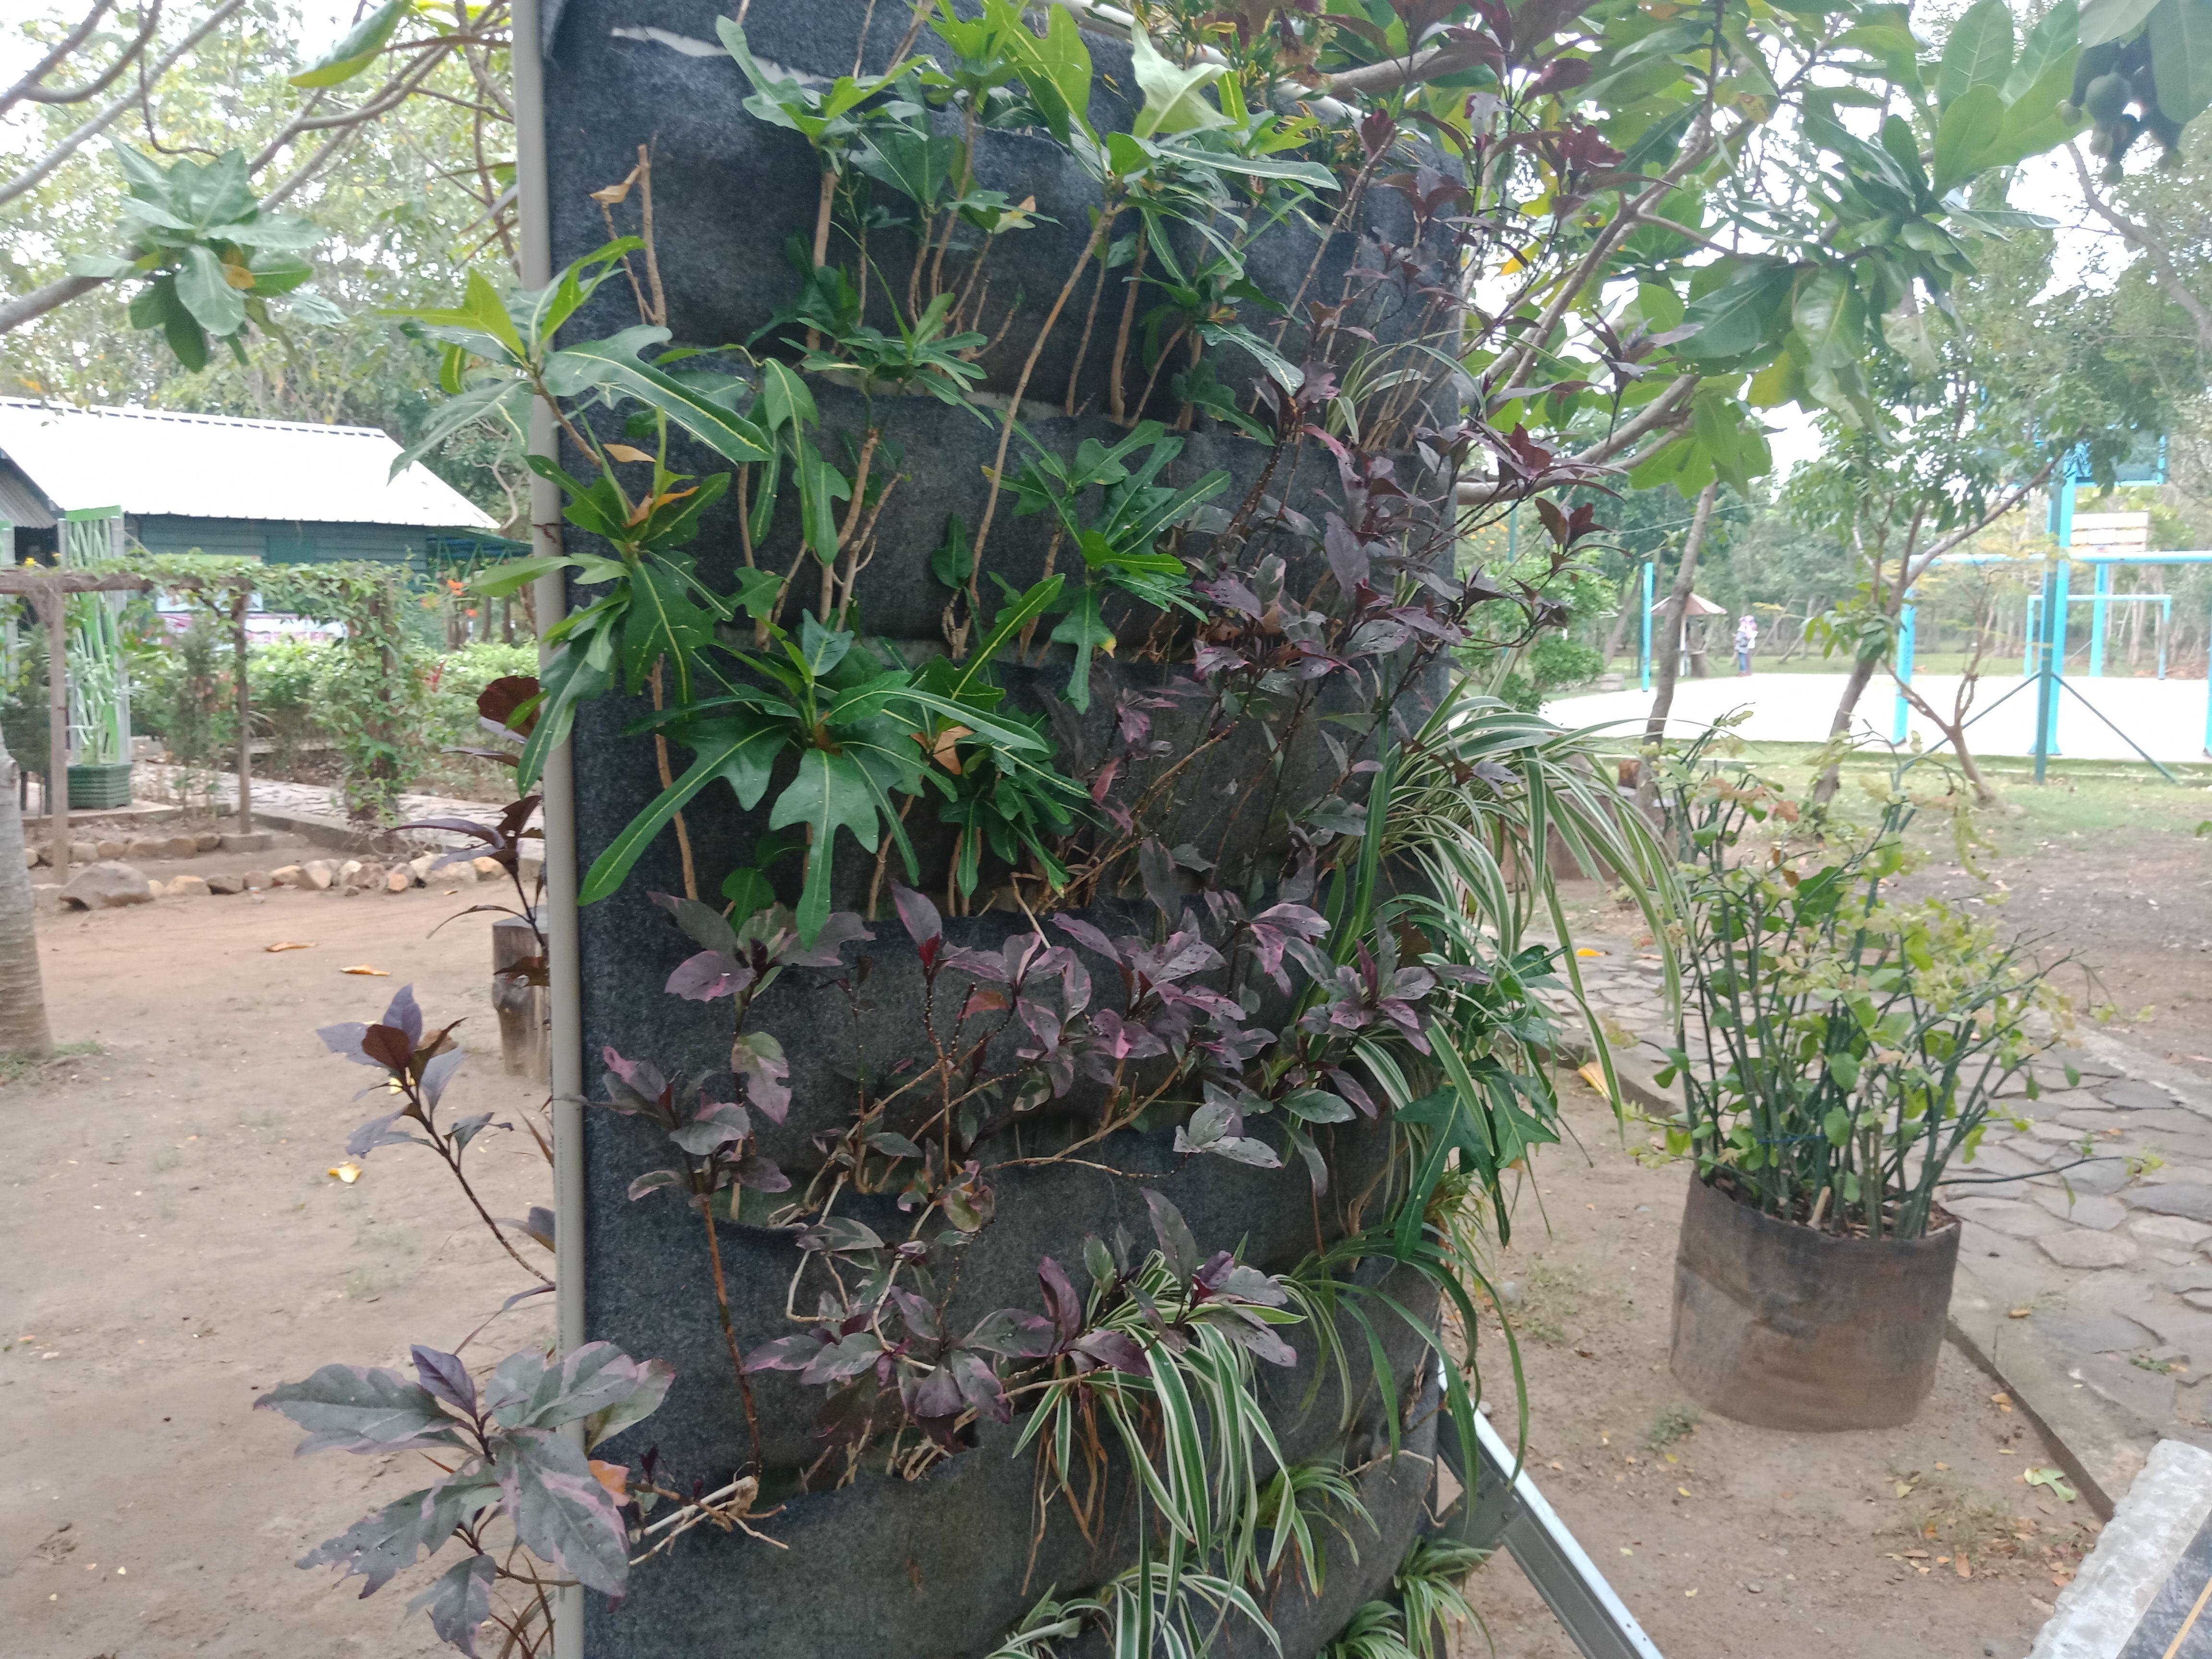 Taman Hutan Kota Bni Banda Aceh Wajib Kunjungi Steemit Istilah